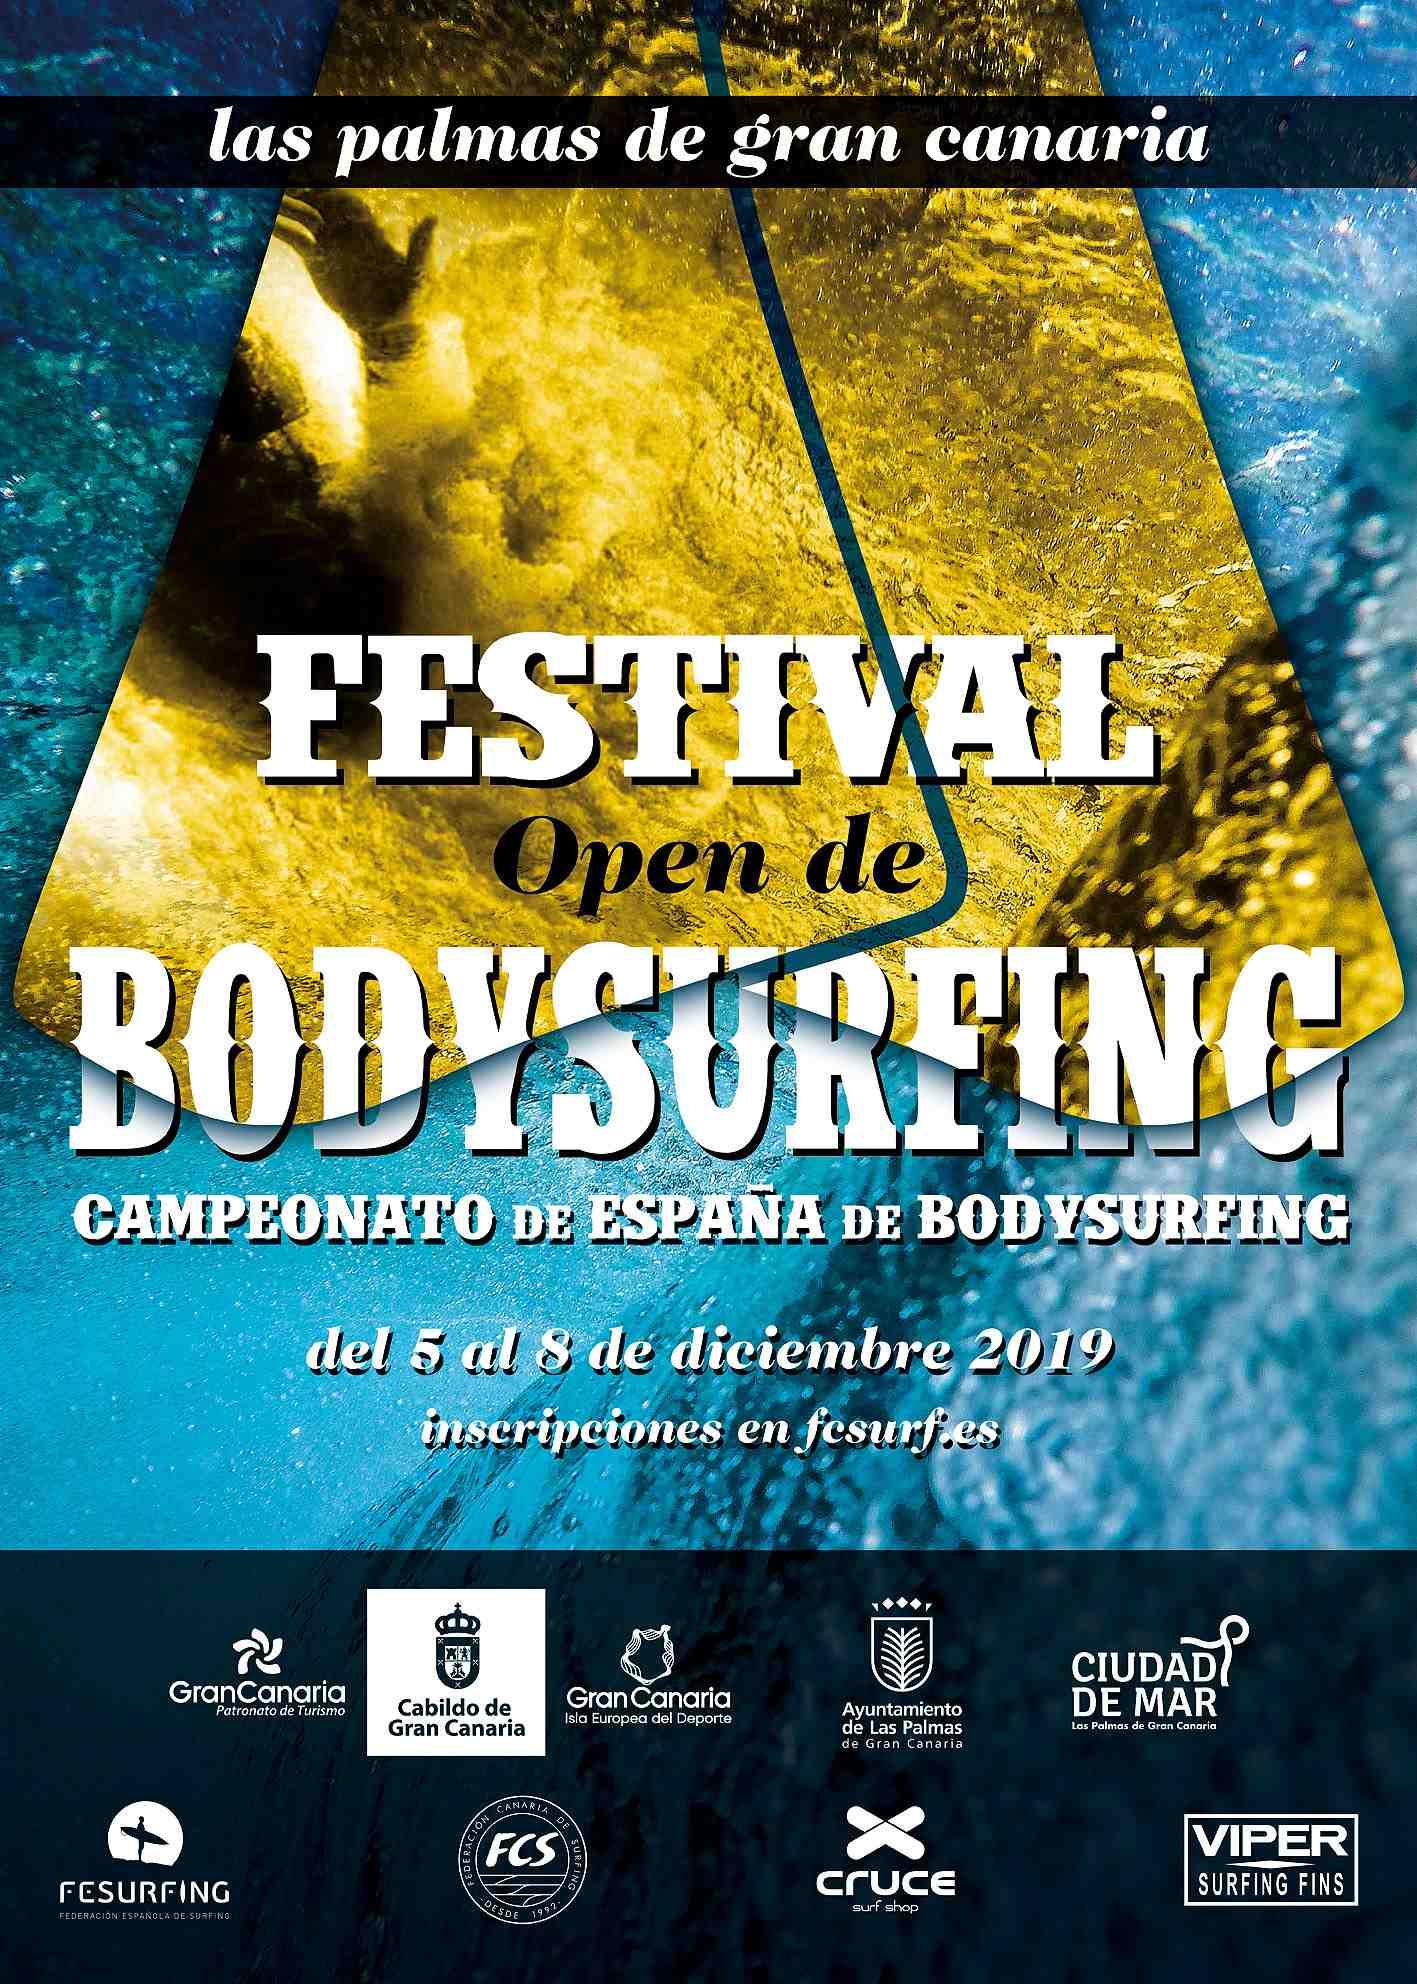 CAMPEONATO DE ESPAÑA DE BODYSURF - NO FEDERADOS - Inscríbete